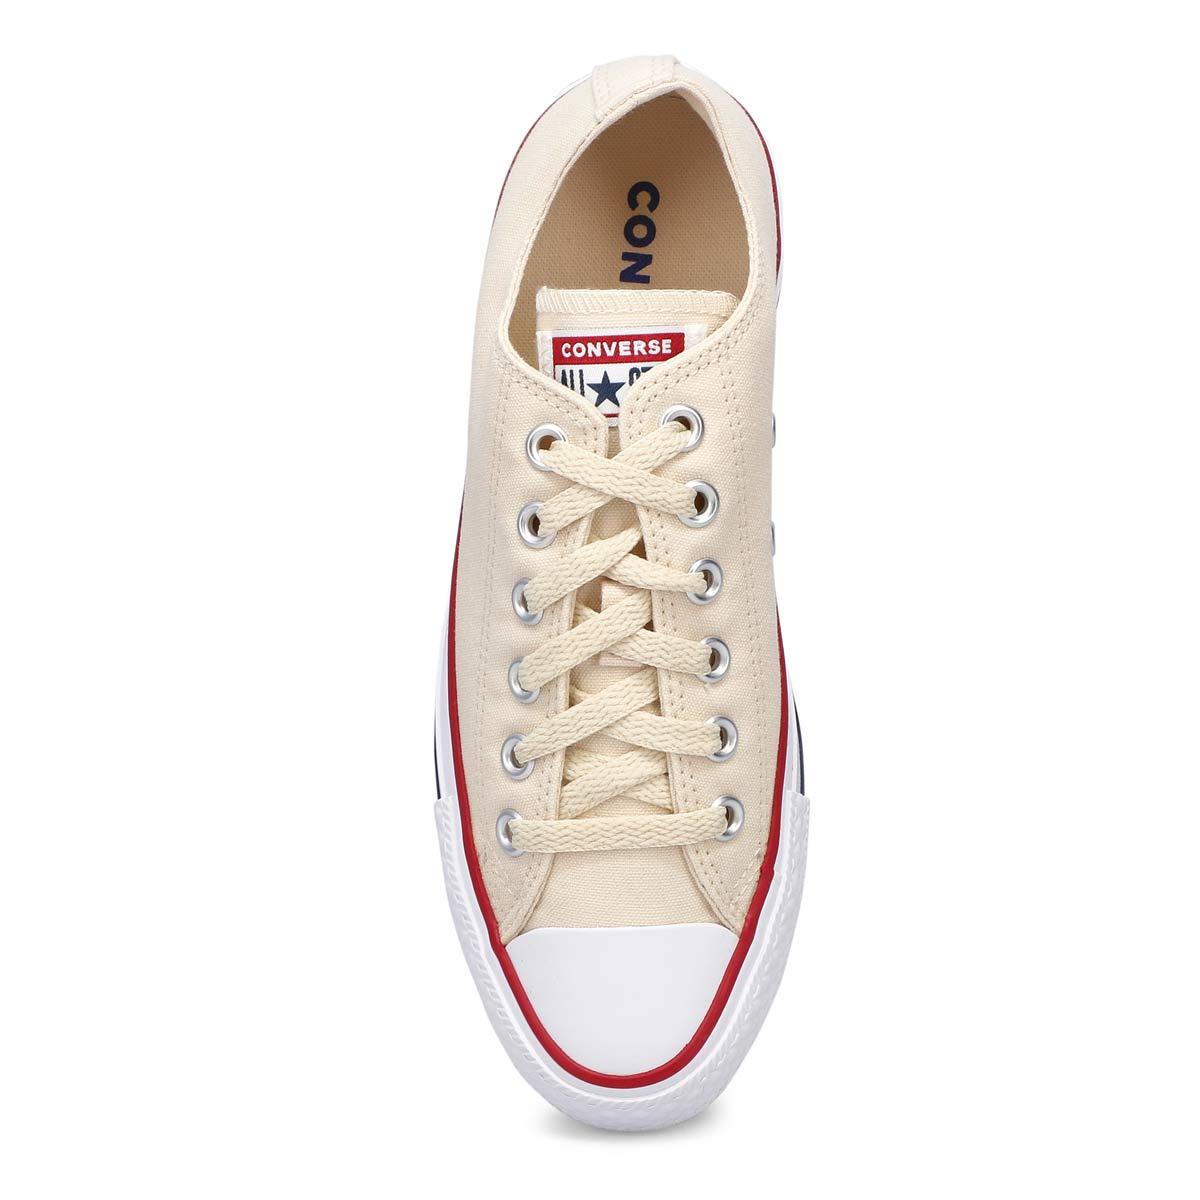 Women's Chuck Taylor All Star Sneaker - Ivory